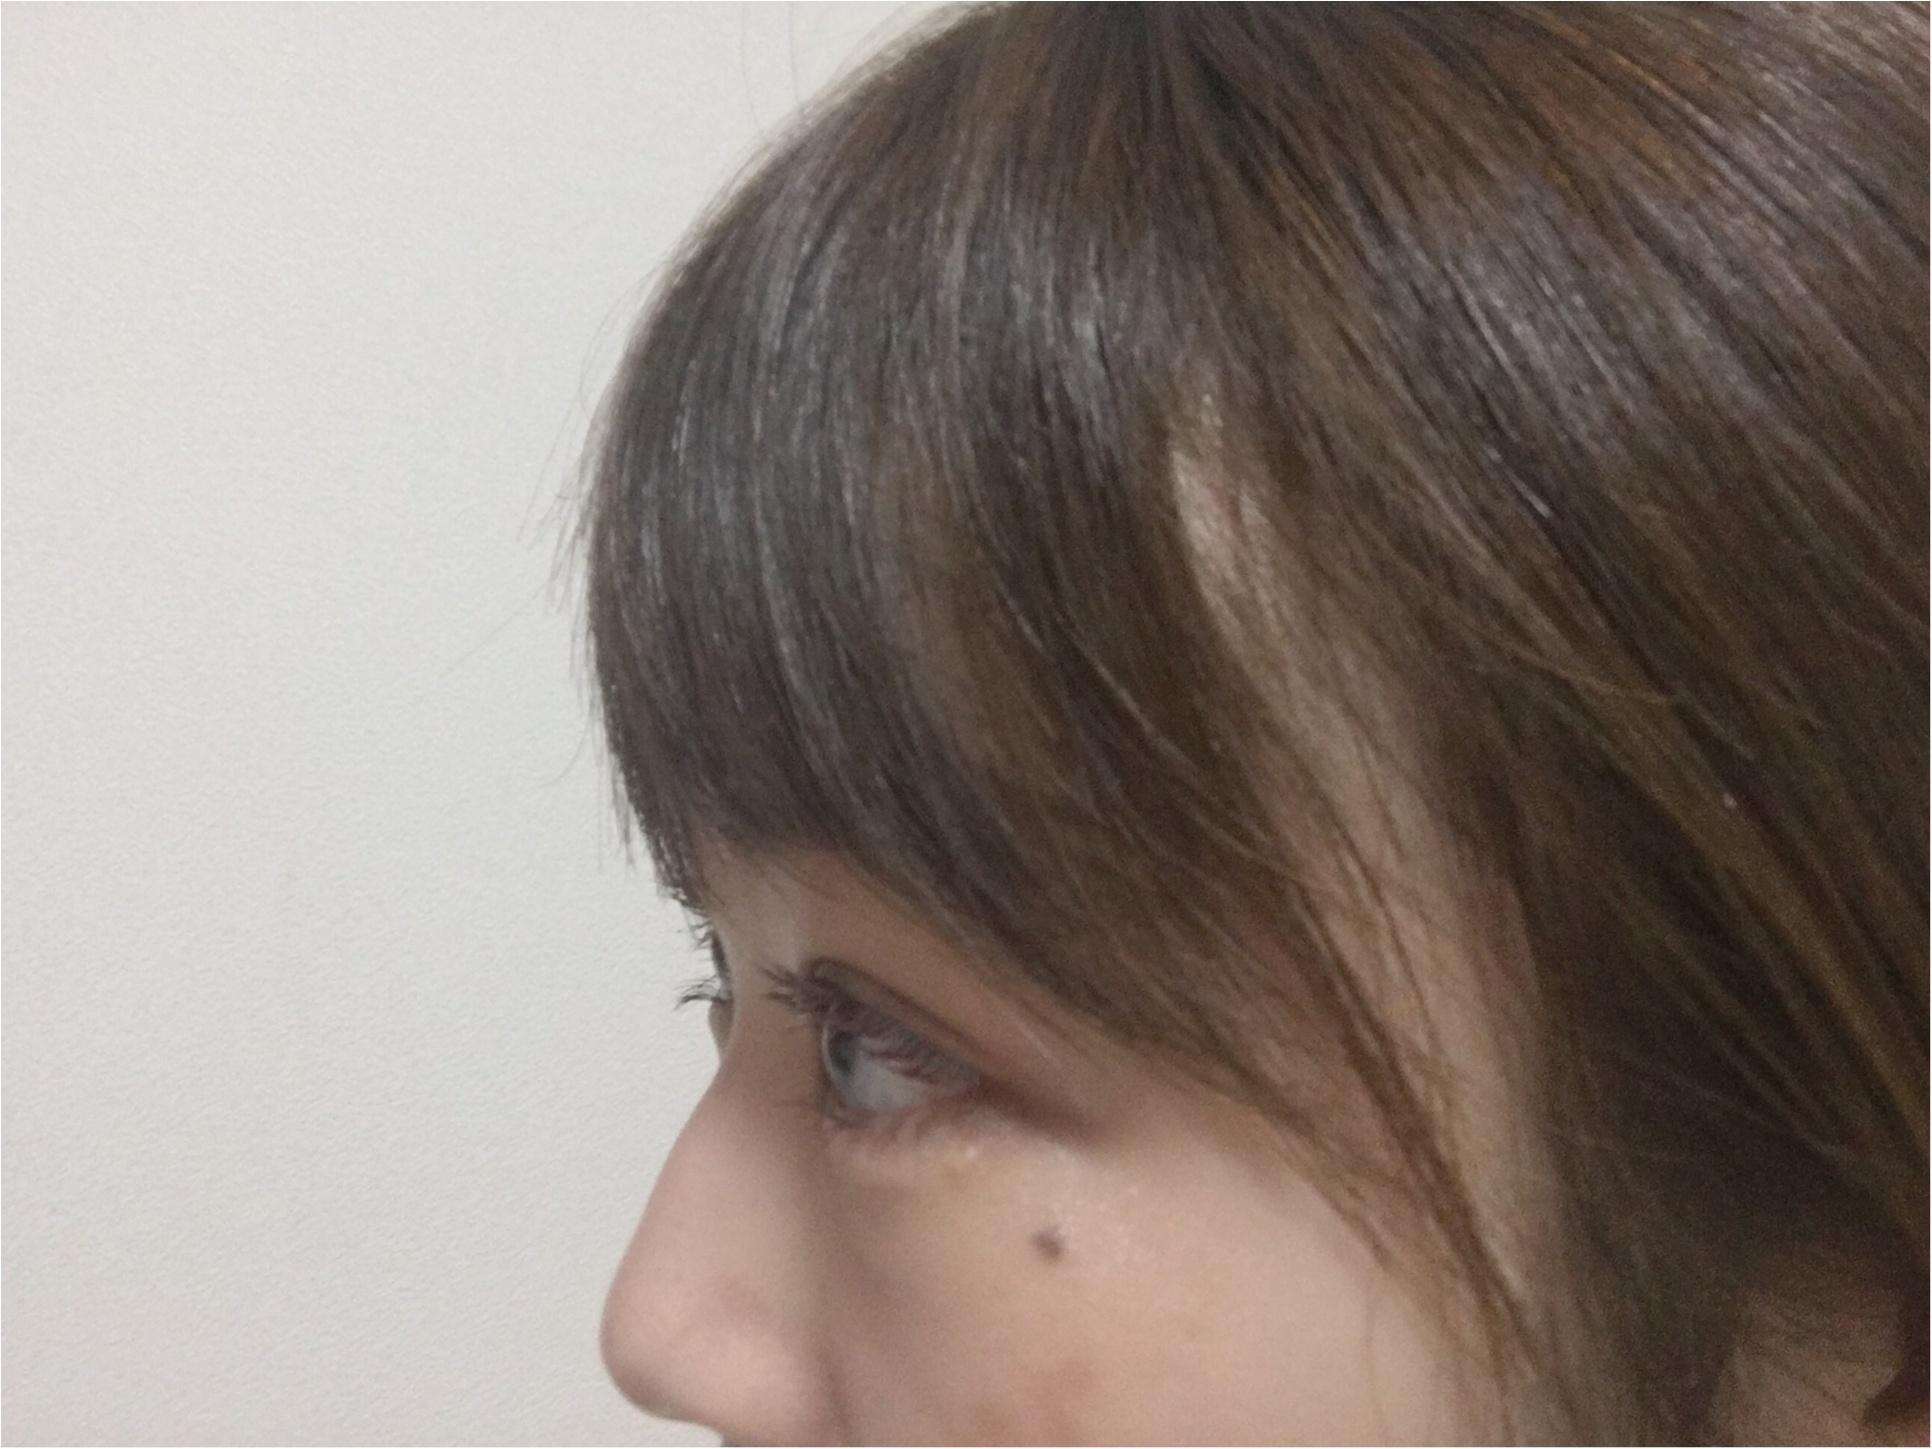 ★【blanche etoile ブランエトワール】のマスカラが可愛い♡♡ナチュラルメイクの時はピンクブラウンで☺︎_3